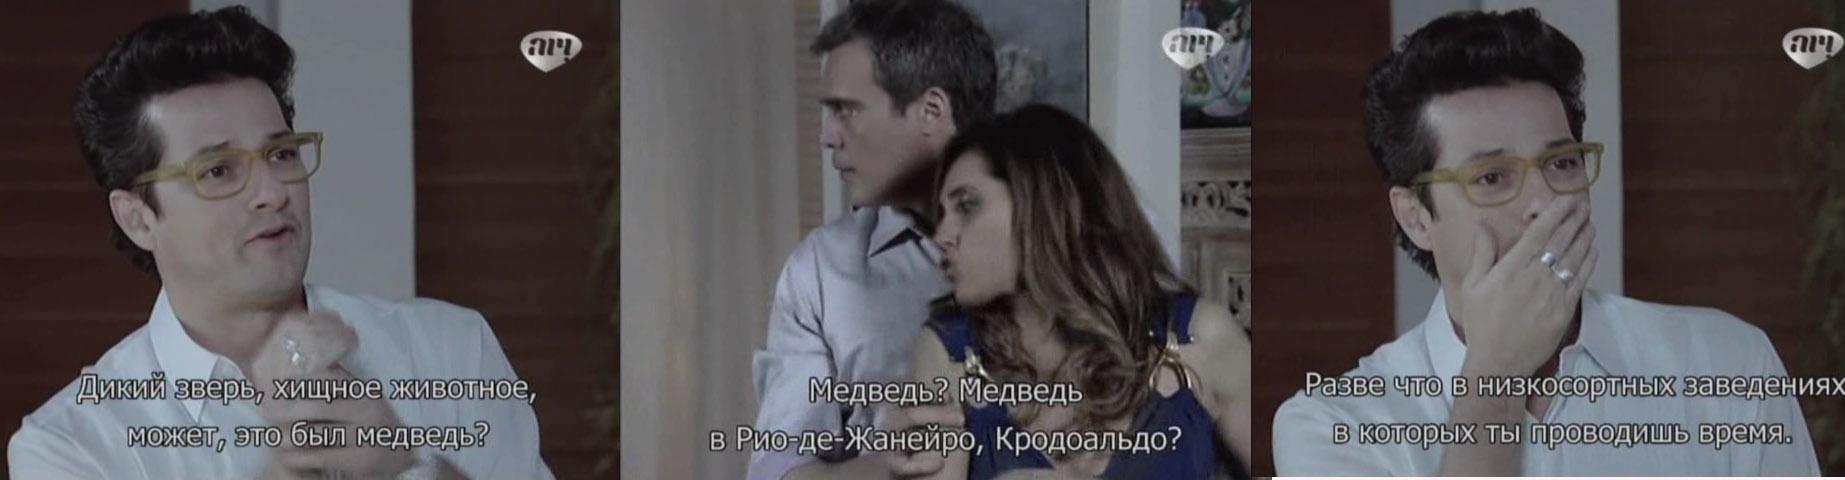 http://4put.ru/pictures/max/573/1761979.jpg